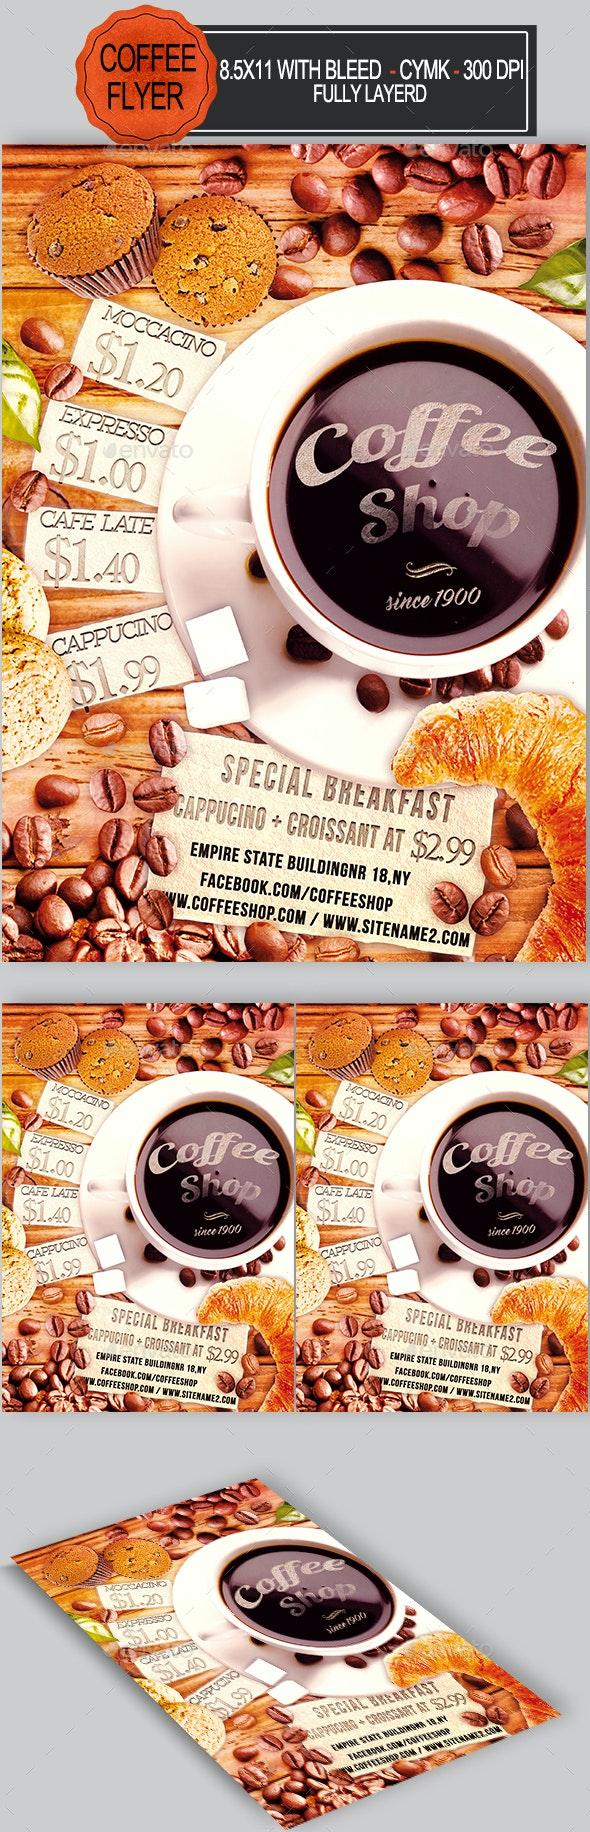 Coffee Shop Flyer Template - Restaurant Flyers